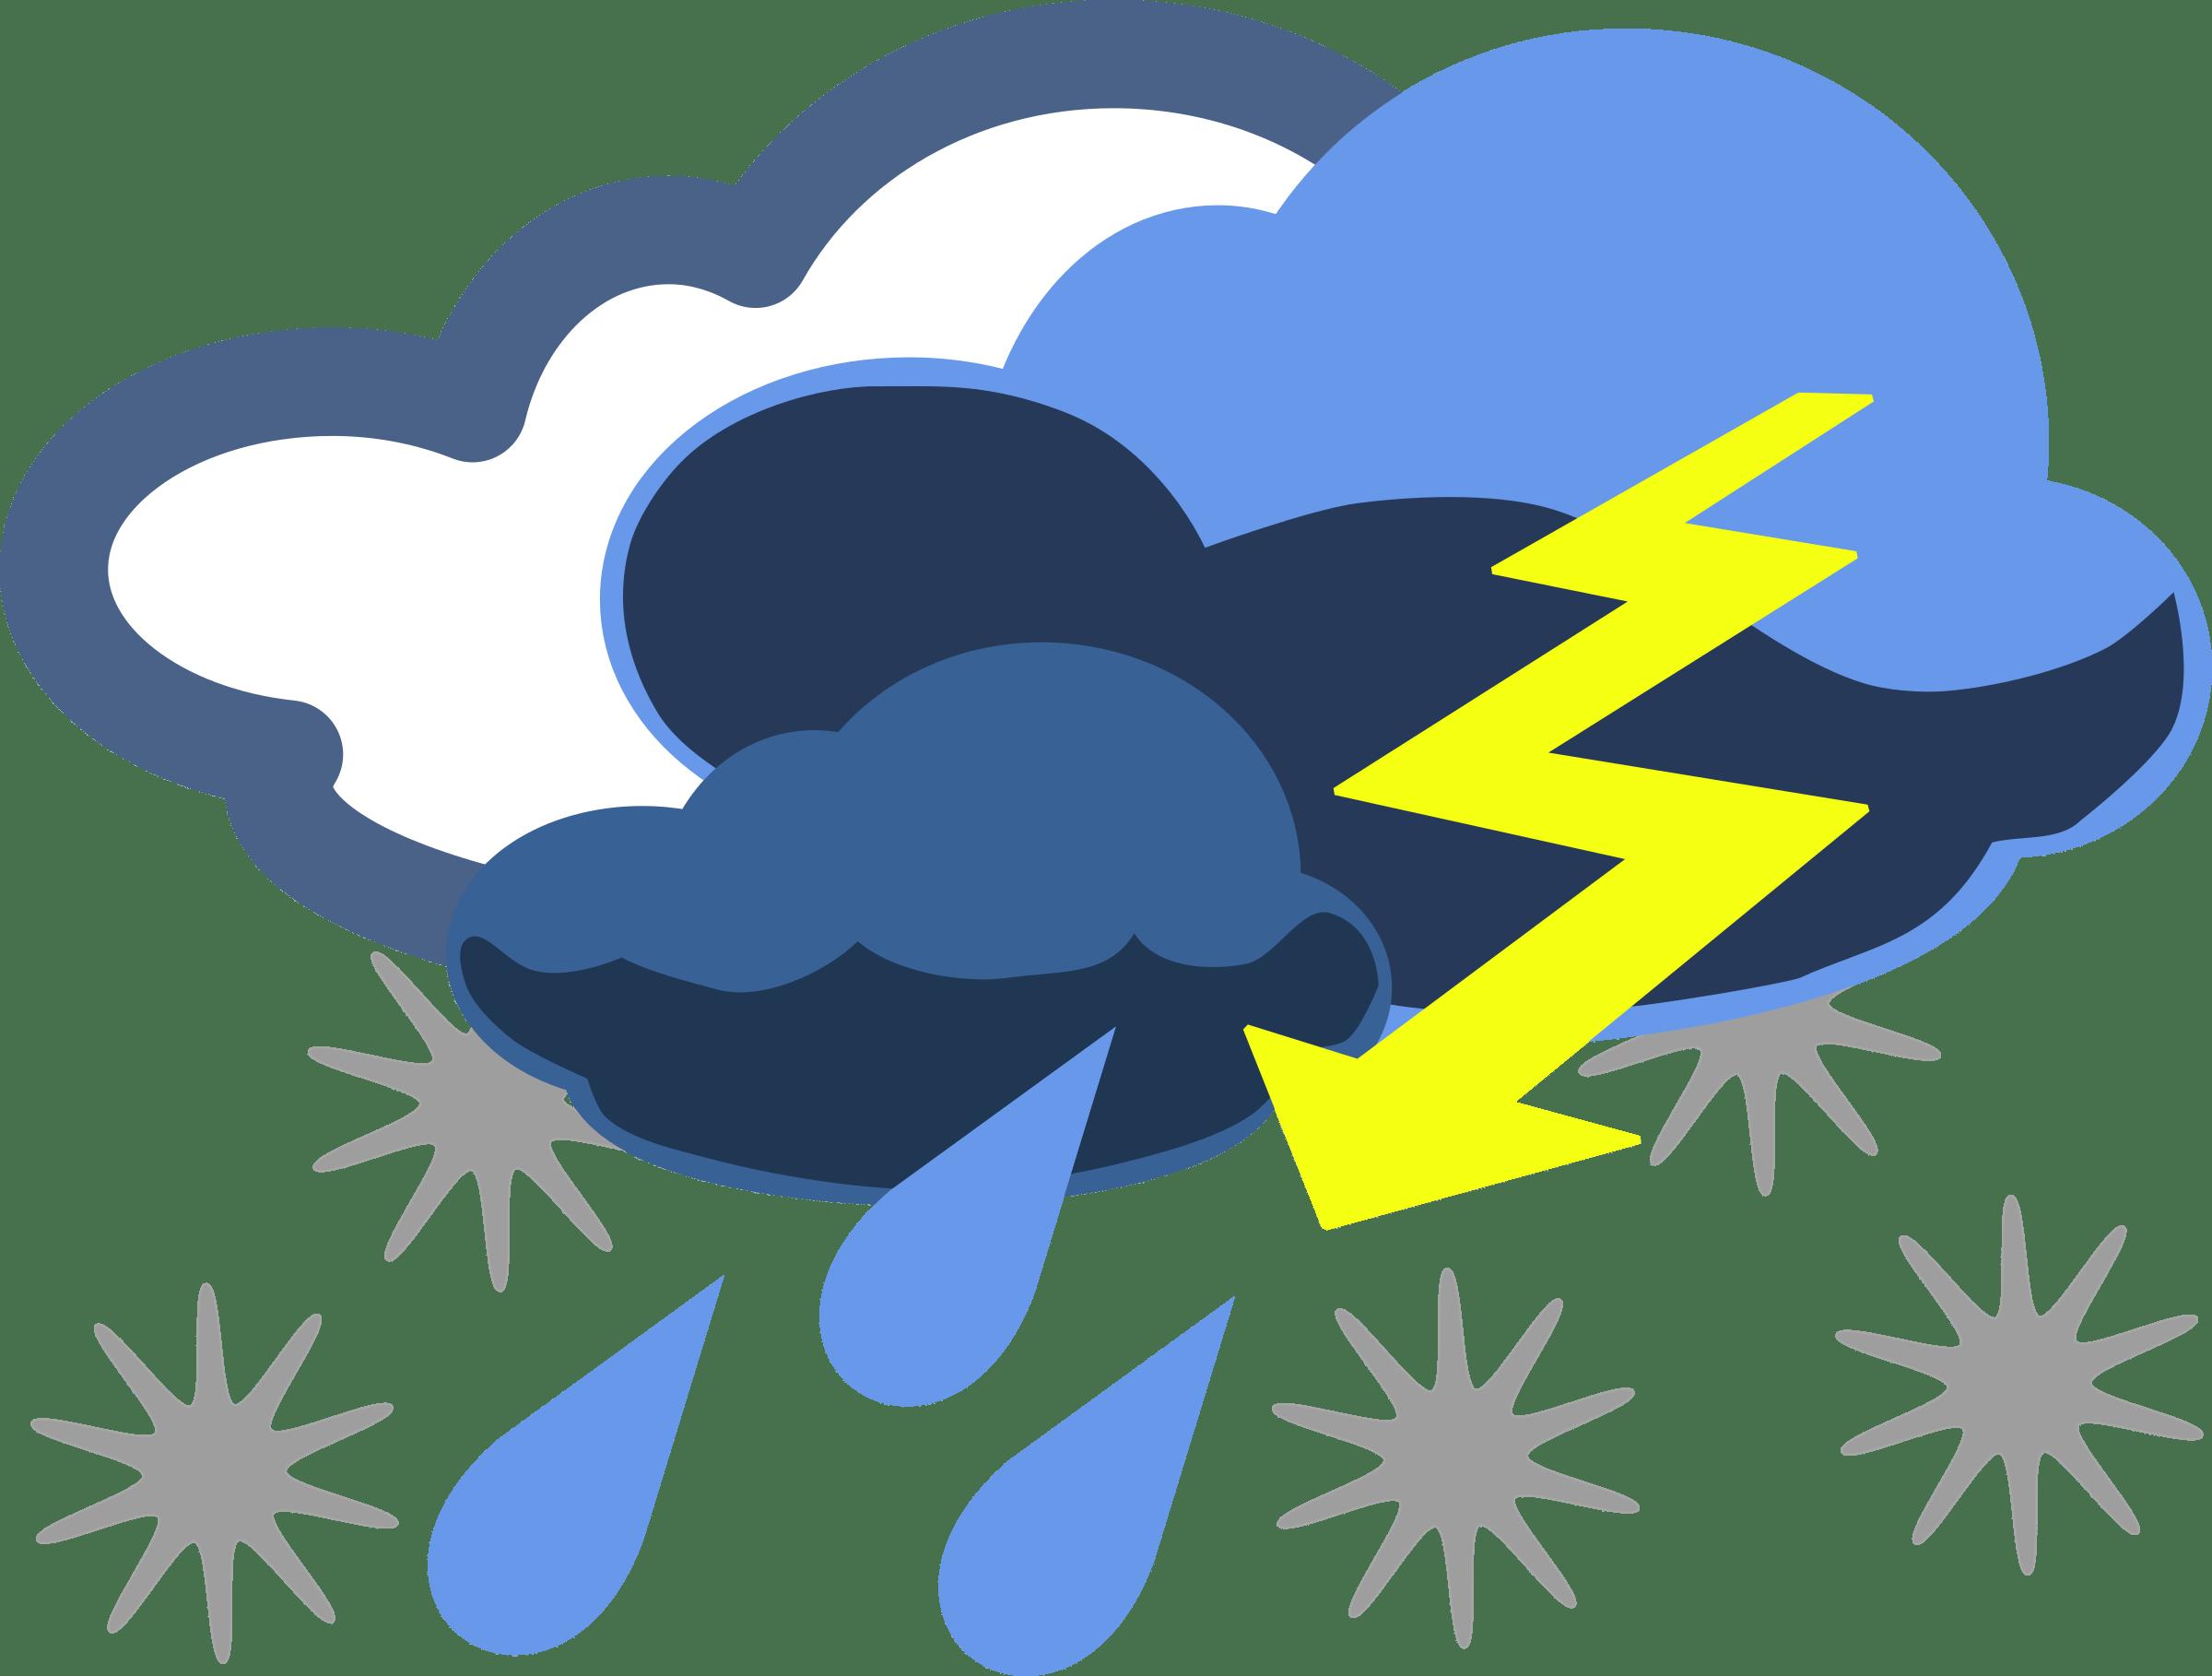 Clipart rain rain storm. Cloud fleurieu regional waste